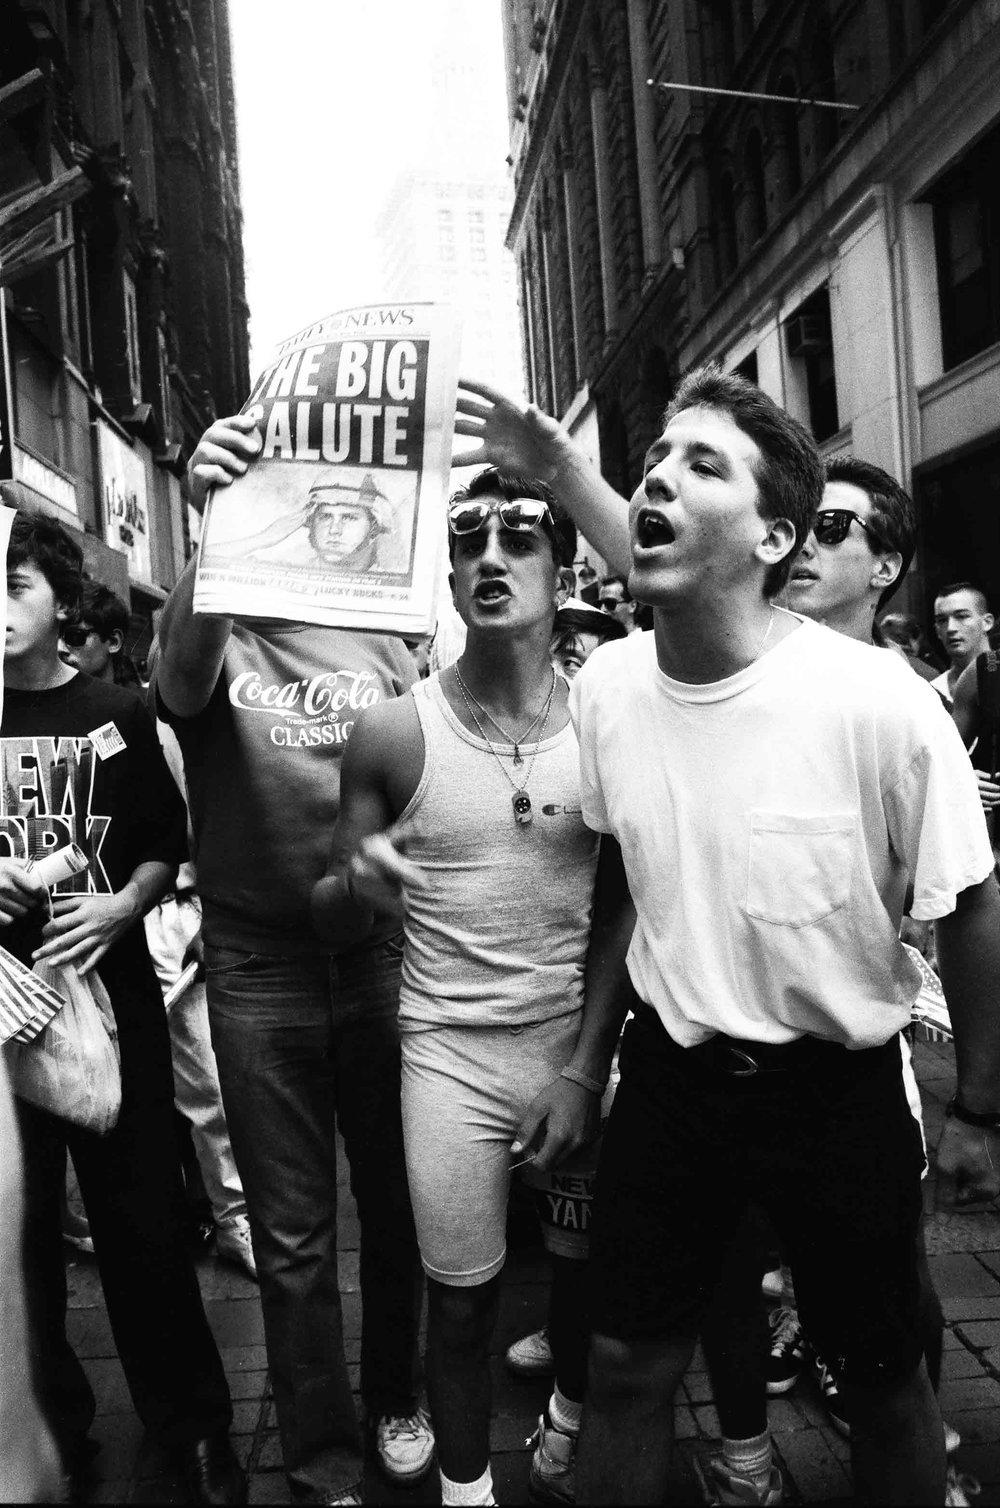 Gulf War Protest 1991 by Salimah Ali